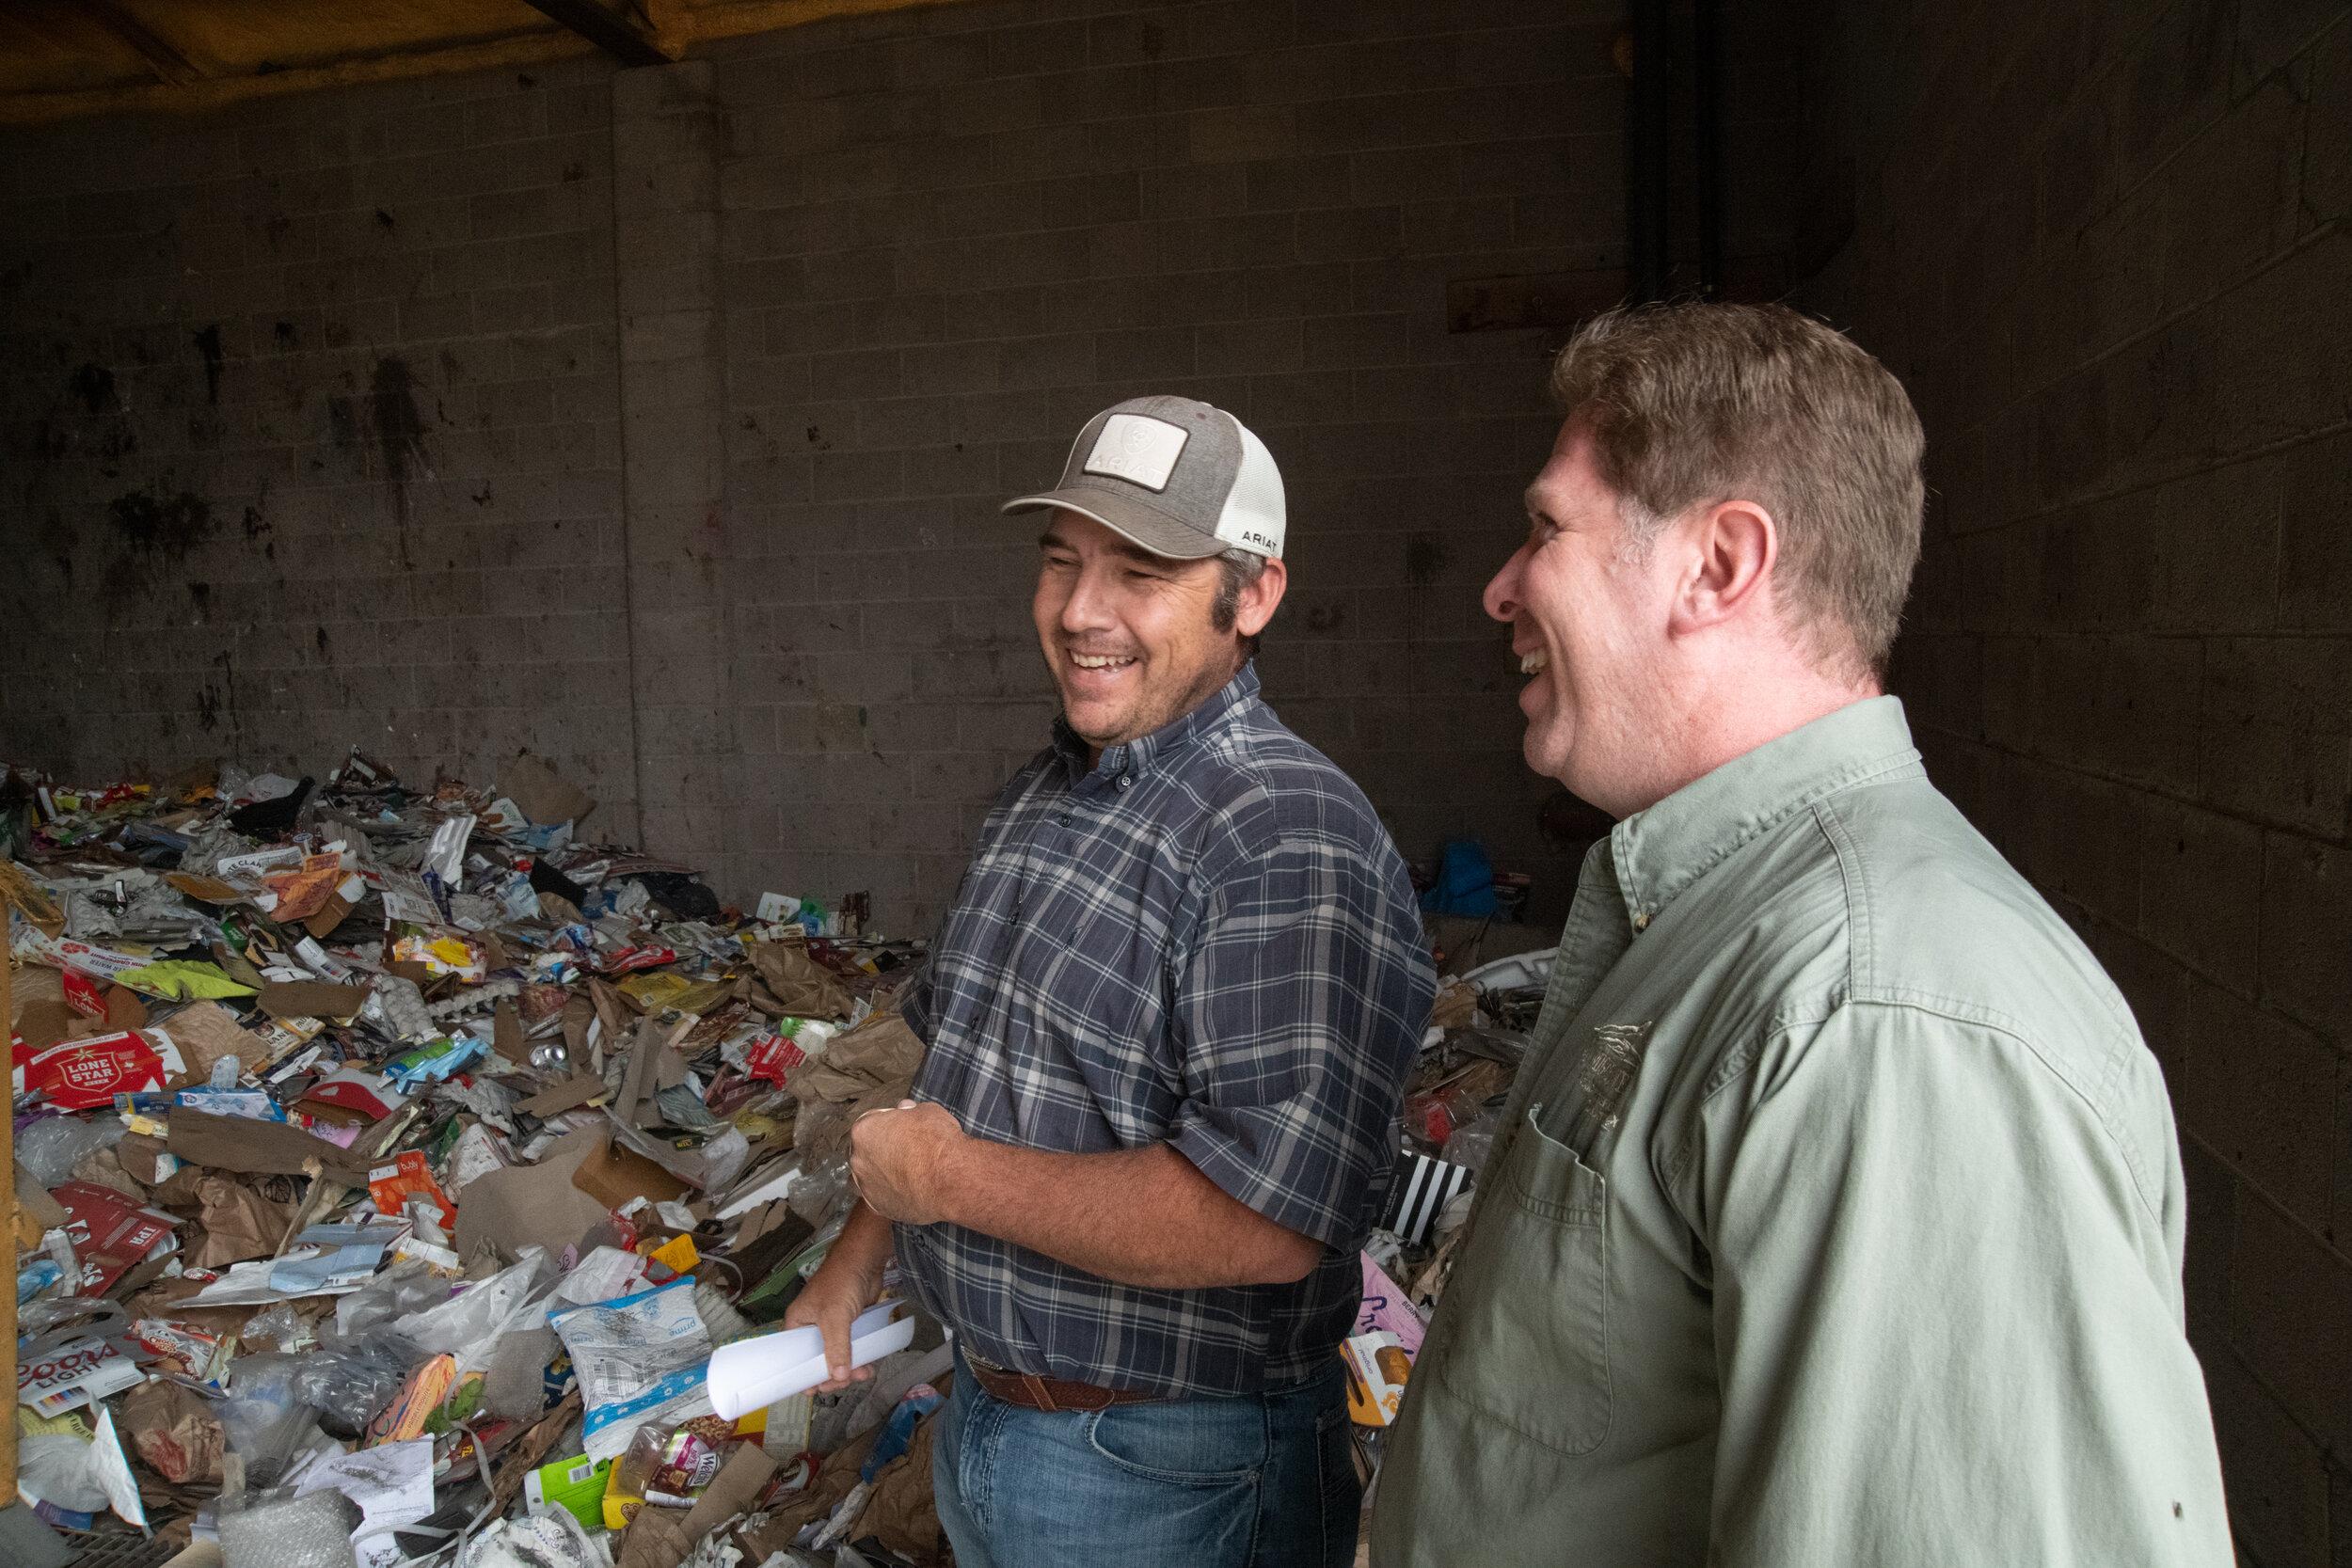 Chris Trosper Owner/Operator Bruin Waste (left) & Alex Shelley Communications Executive SMPA (right)